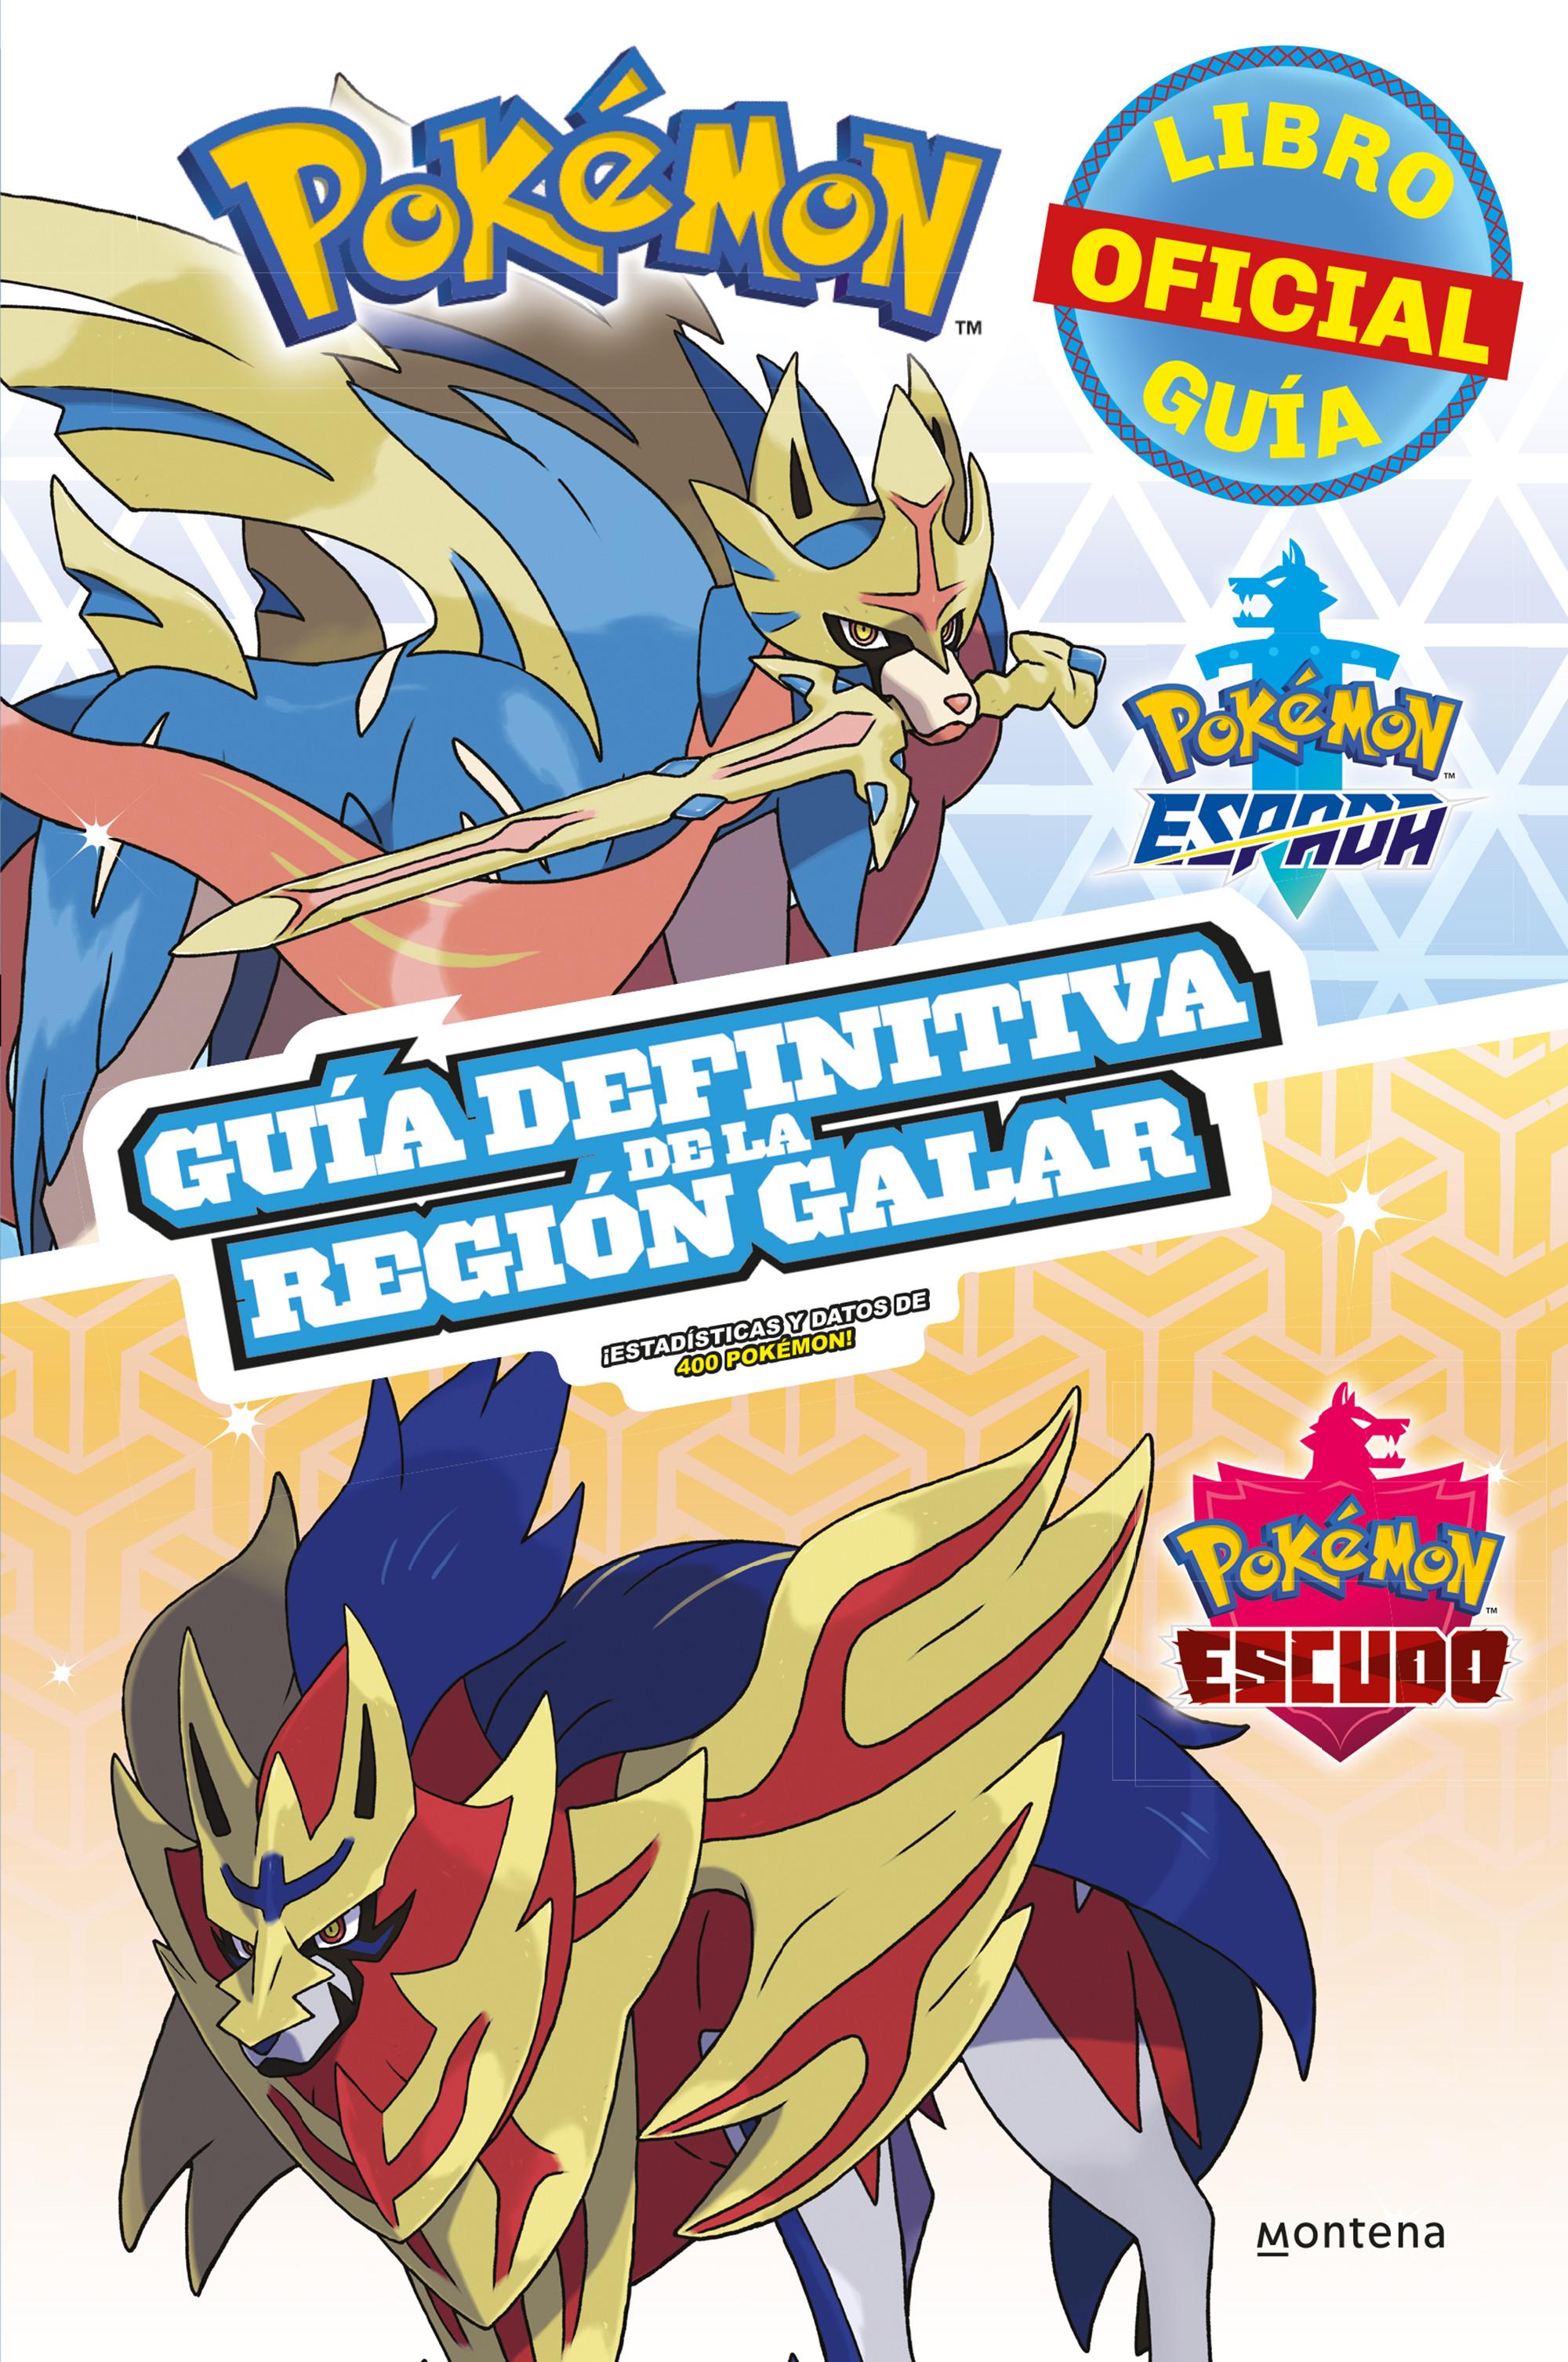 Pokémon guía definitiva de la Región Galar. Libro oficial. Pokémon Espada / Pokémon Escudo